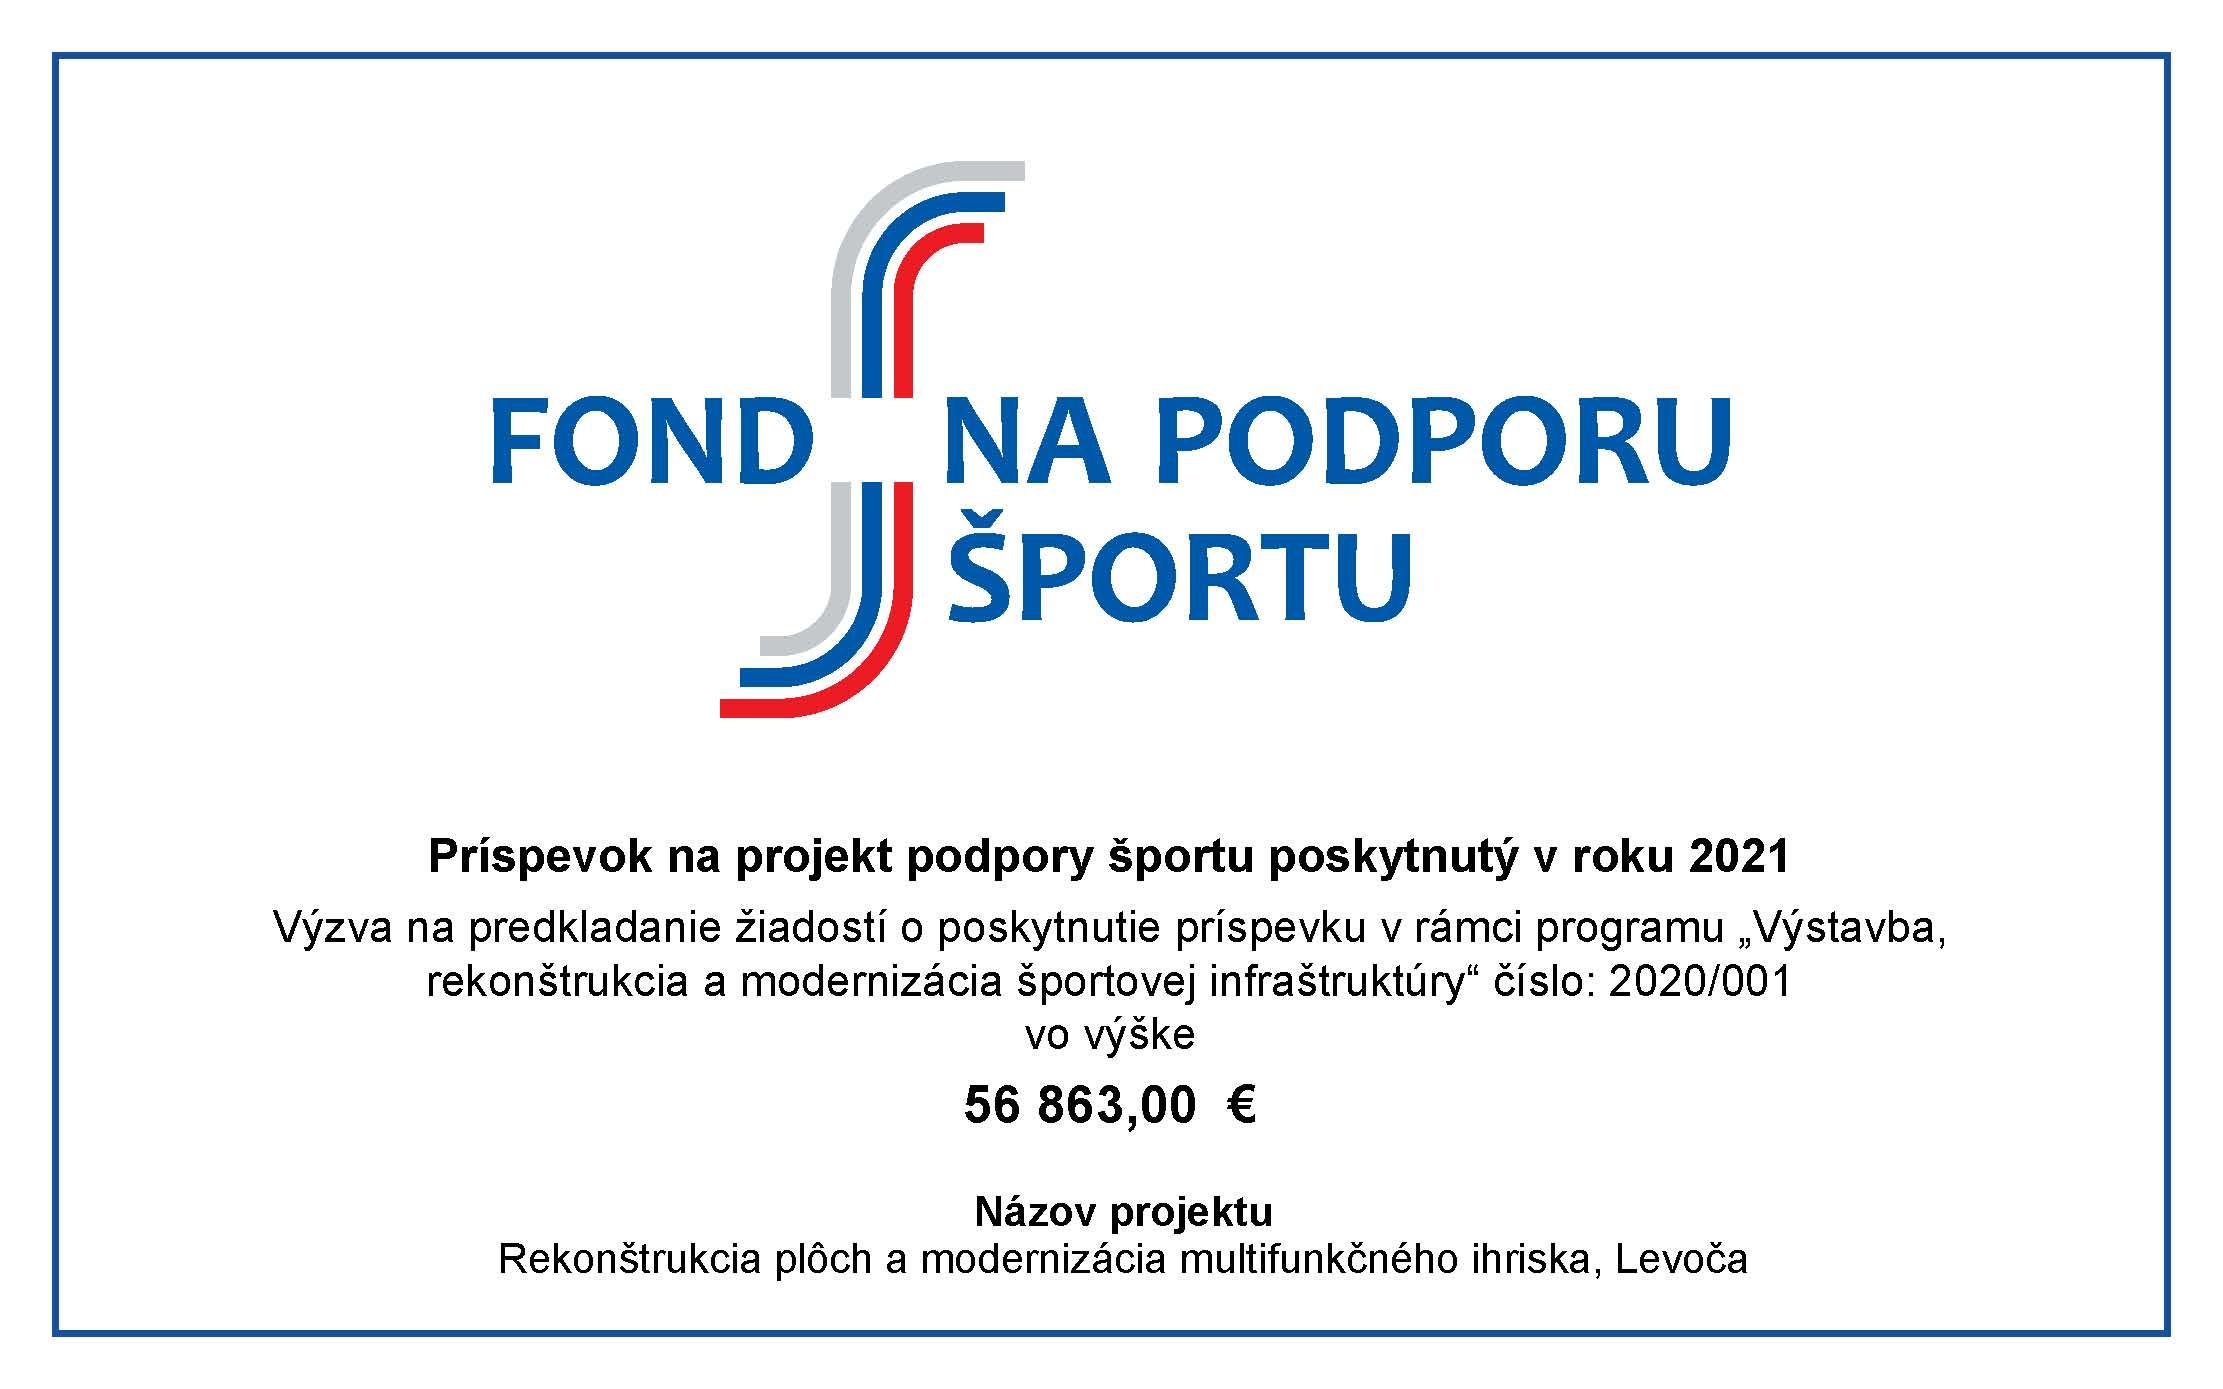 Fond na podporu športu